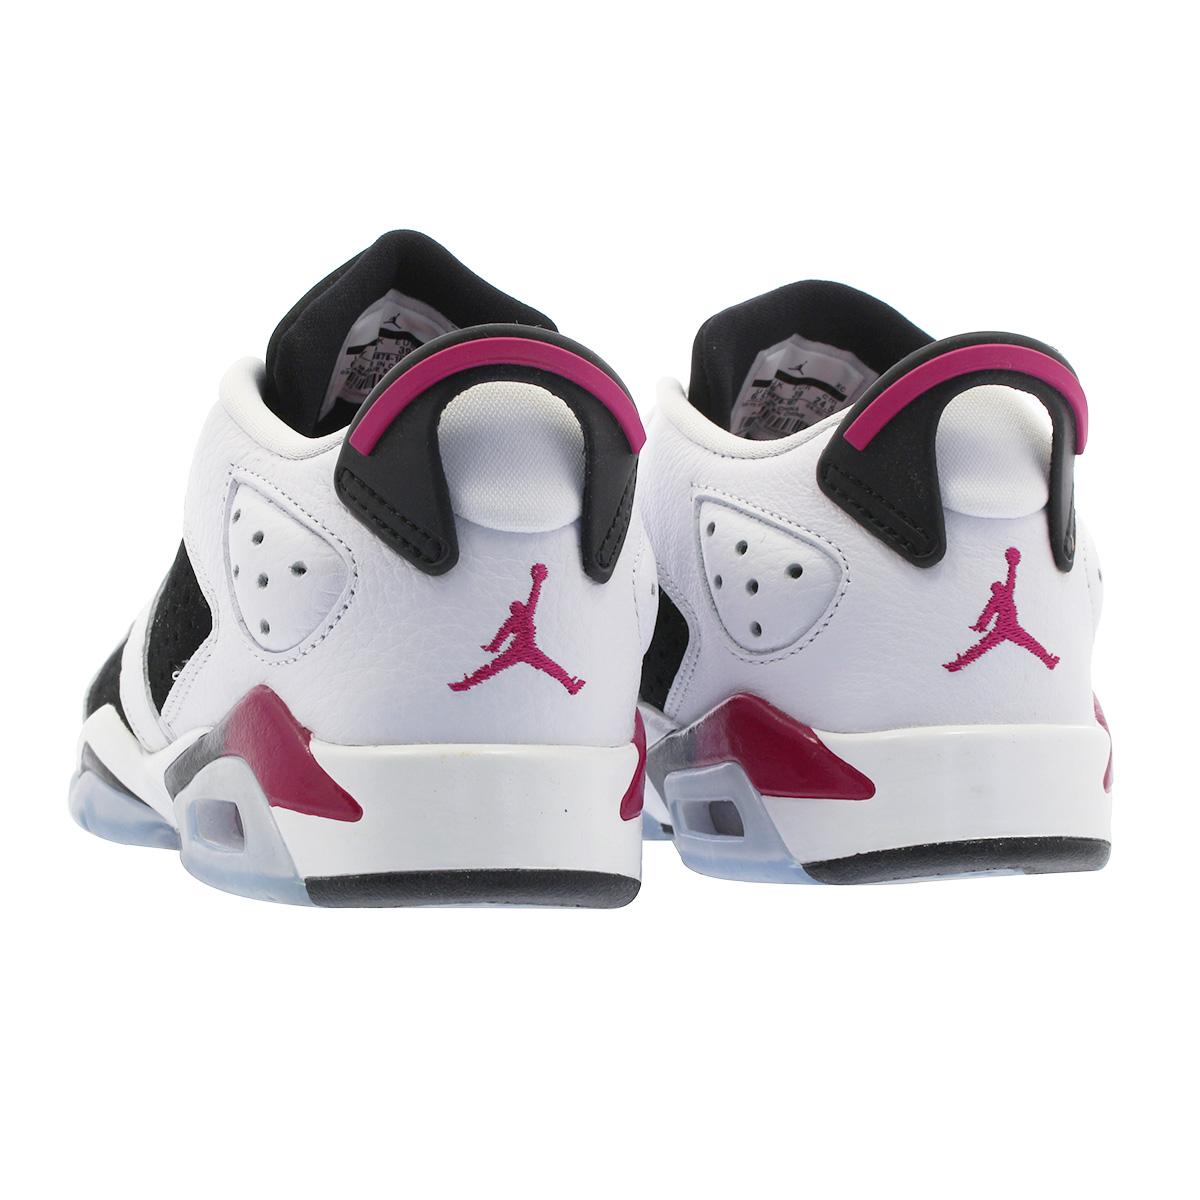 a53b30a2f9f4 NIKE AIR JORDAN 6 RETRO LOW GG Nike Air Jordan 6 nostalgic low GG WHITE  FUCHSIA BLACK 768